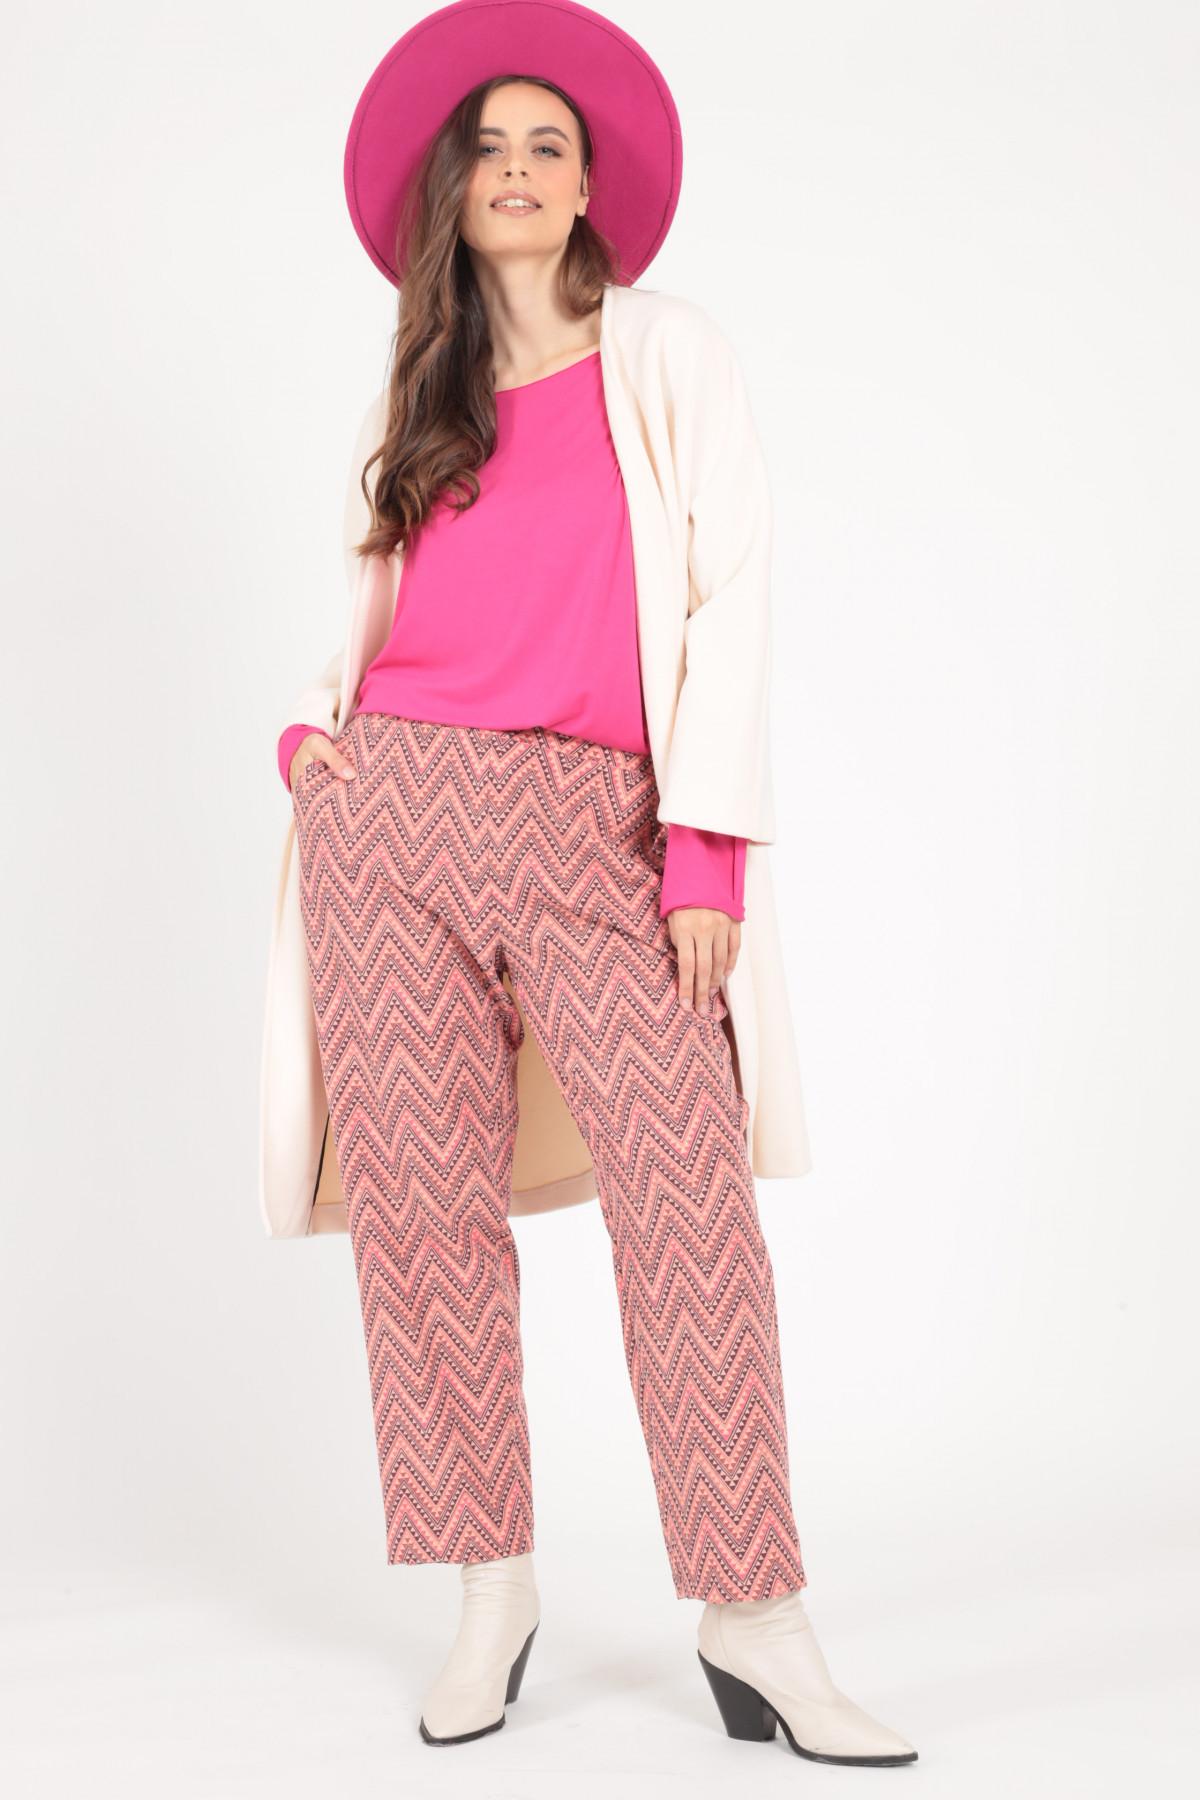 High Waist Trousers in Multicolor Herringbone Pattern